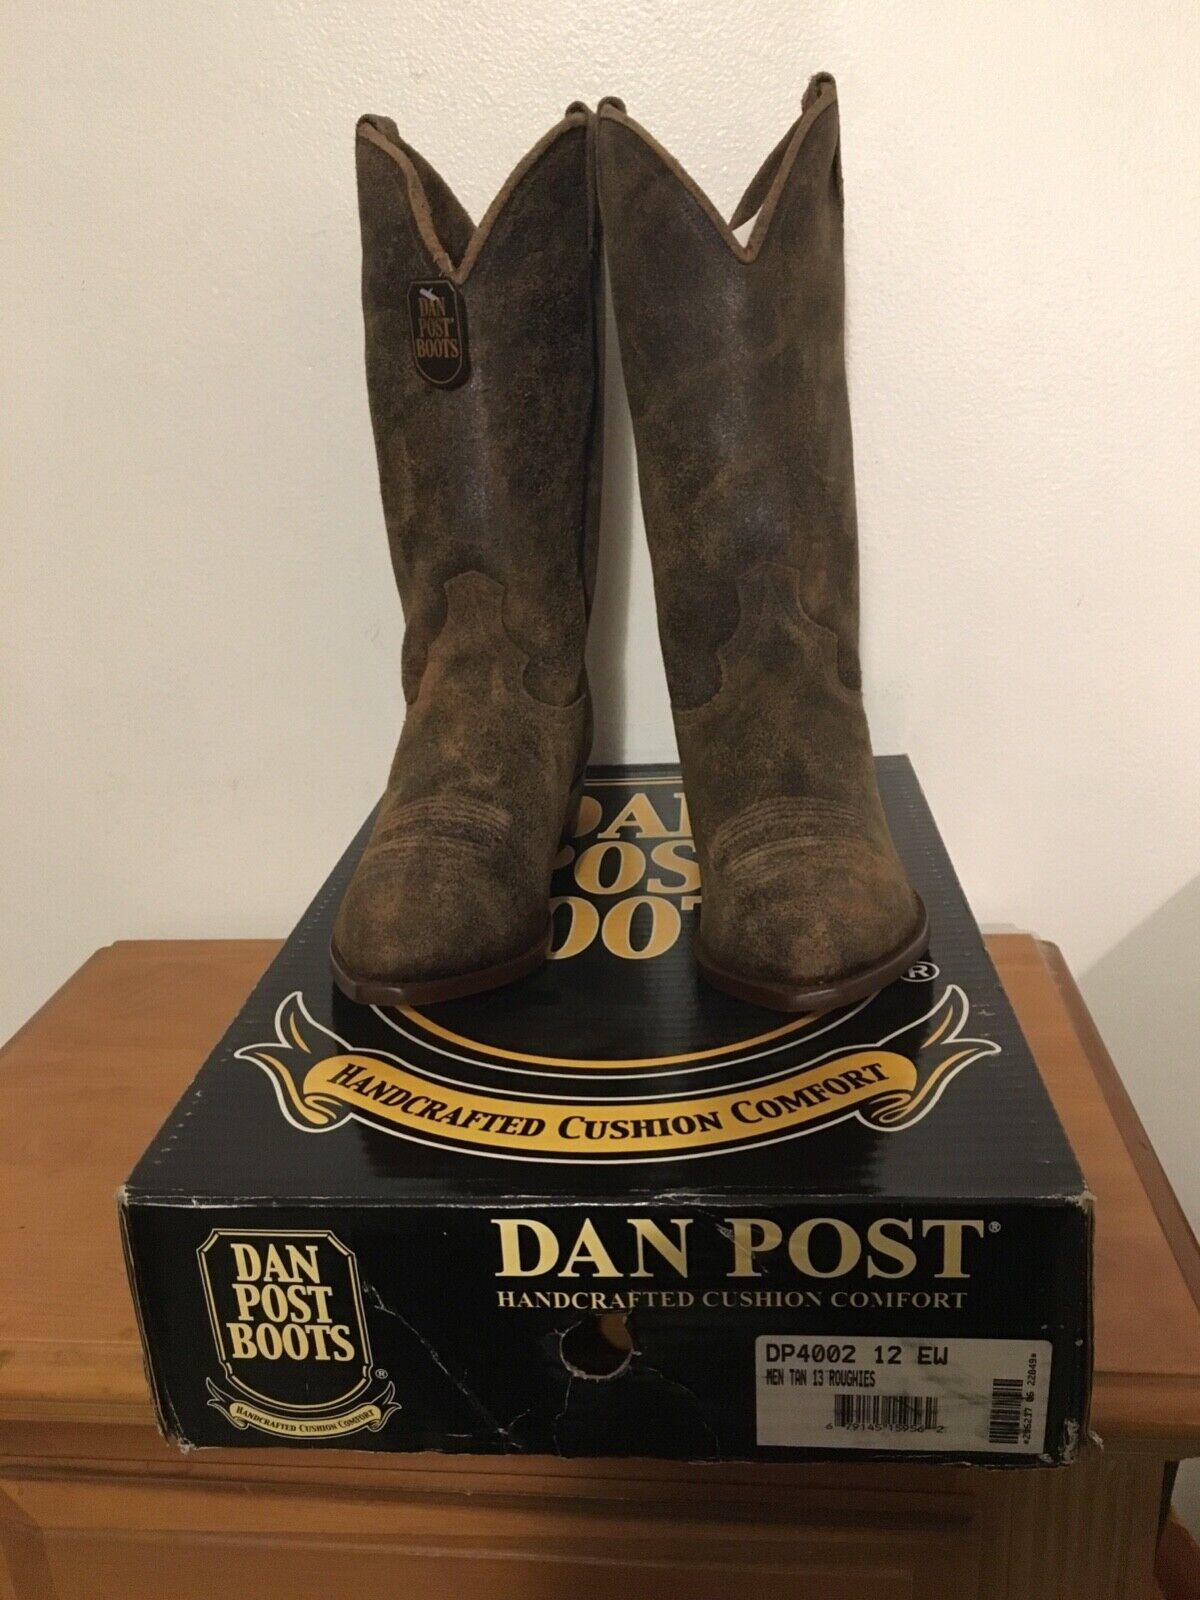 Dan Post para hombre DP4002 12EW tan roughies 13